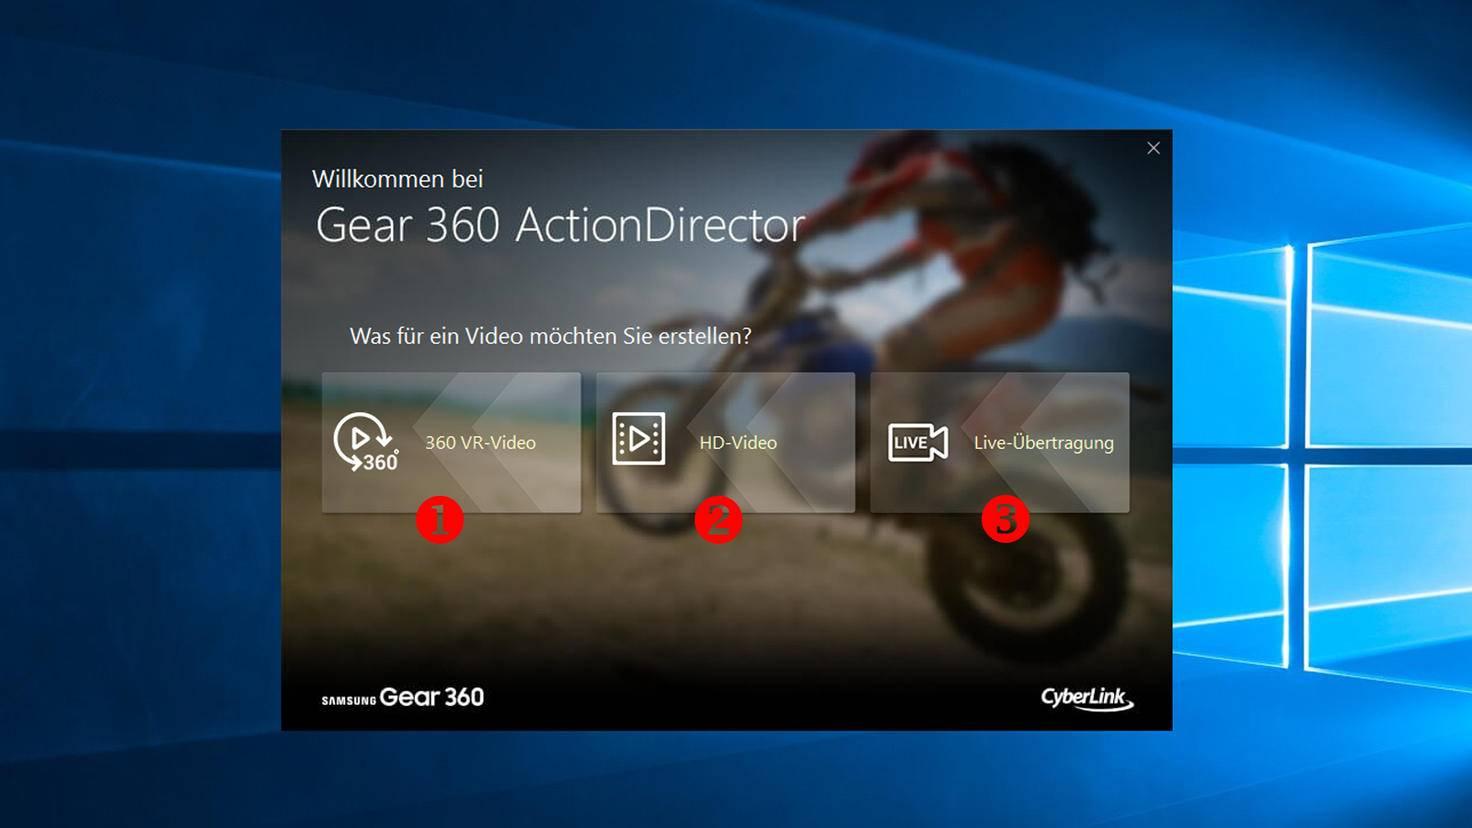 Samsung Gear 360 ActionDirector